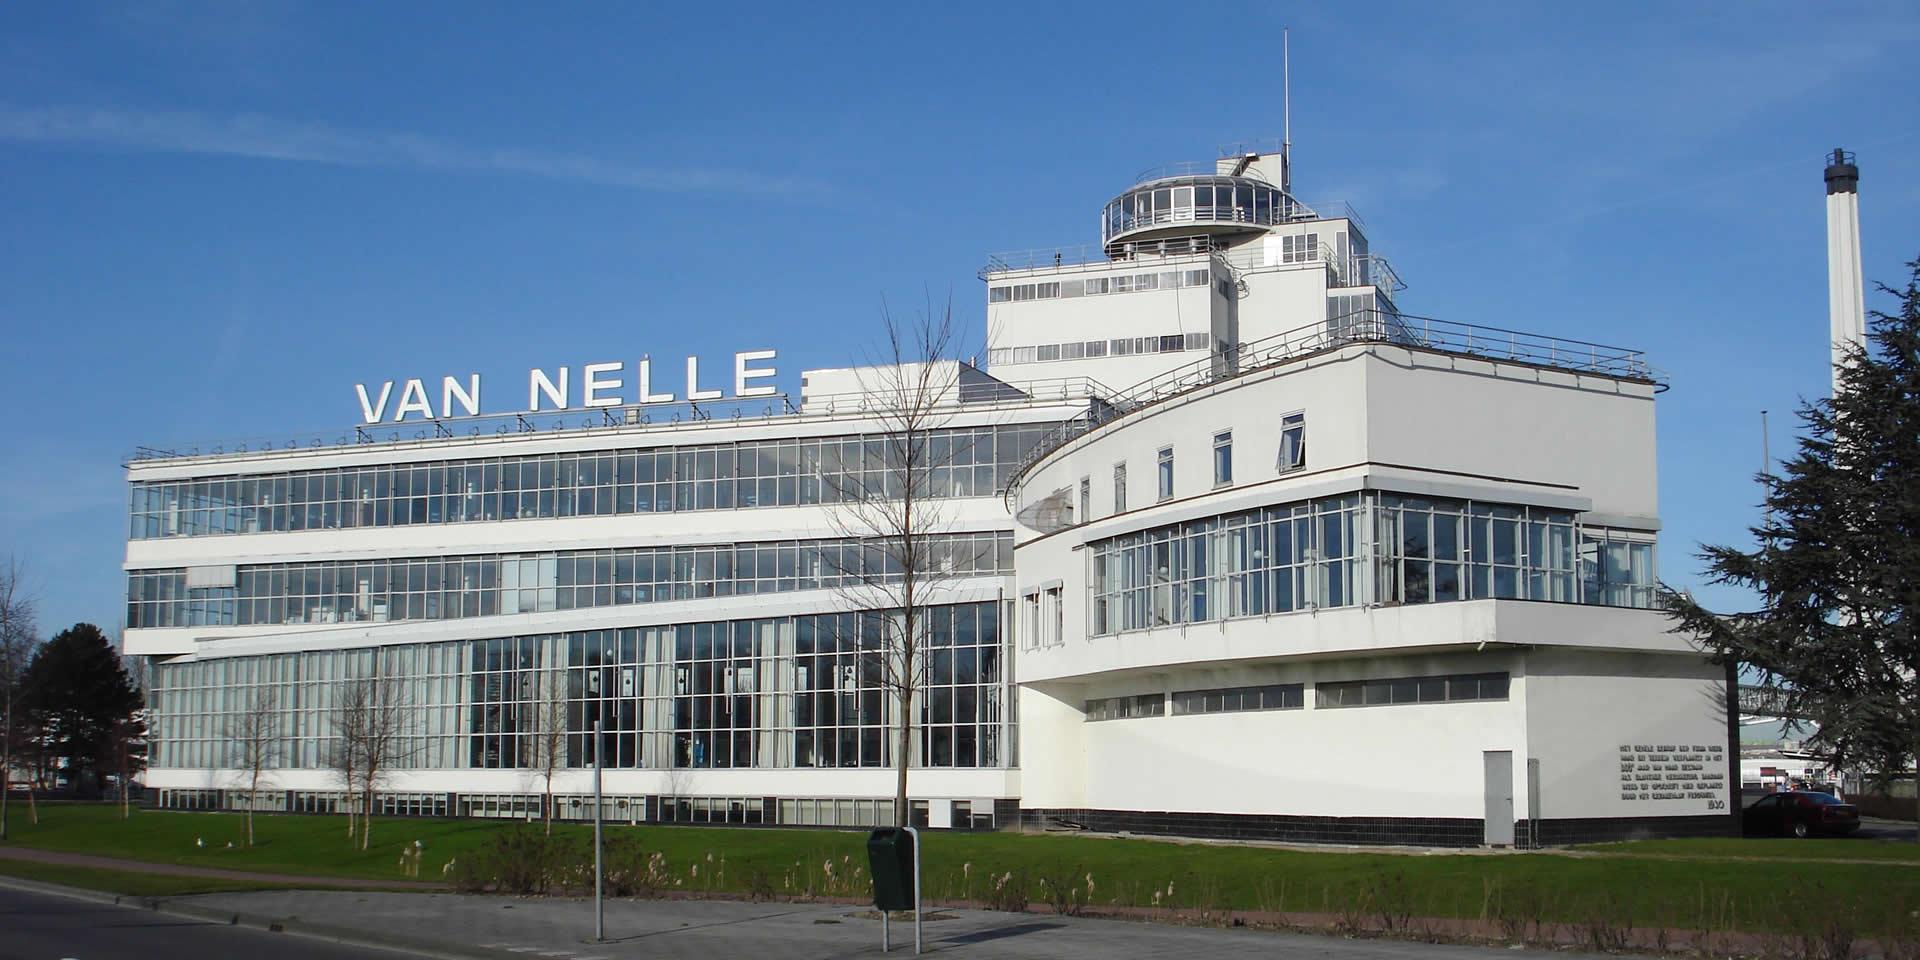 Rotterdam - Van Nelle Fabriek